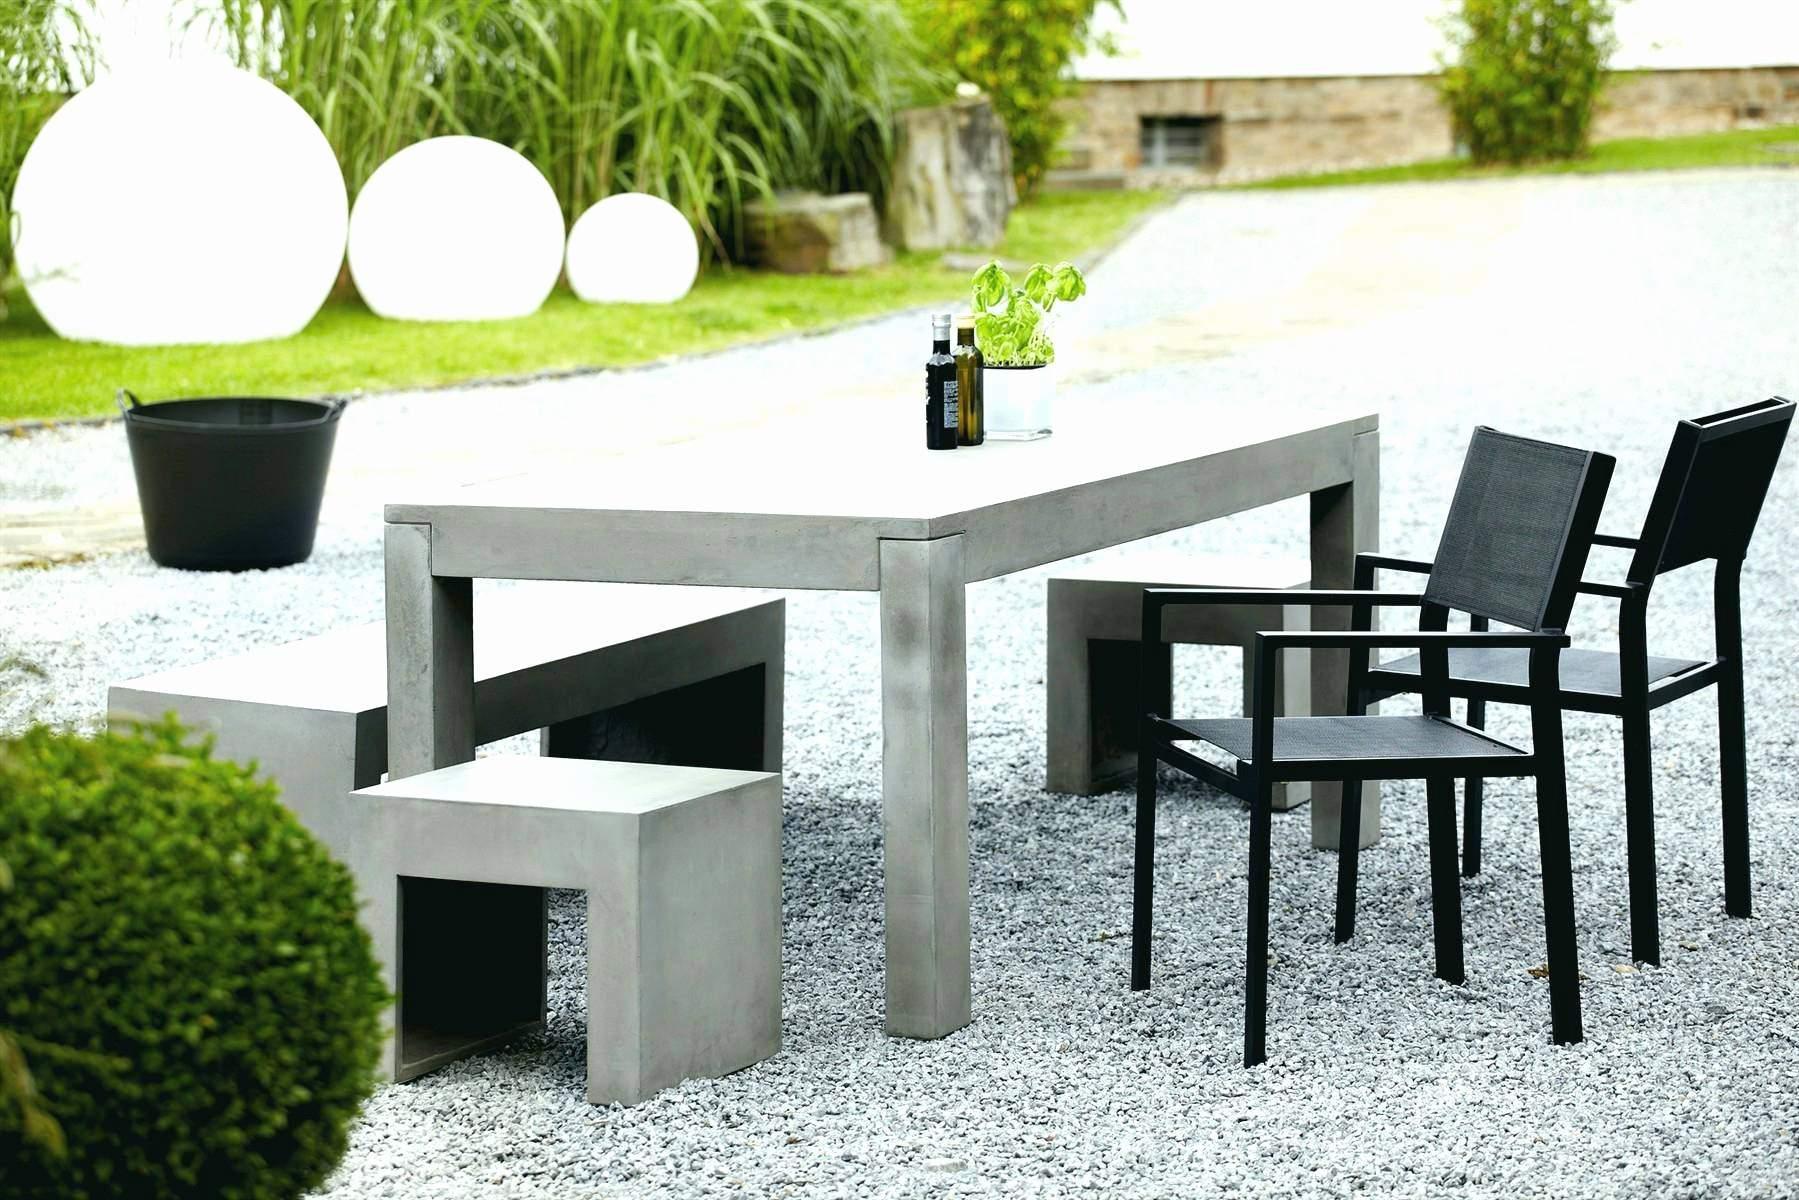 kleine garten sitzgruppe terrasse idee frisch idee de terrasse terrassen bodenplatten 0d fur of kleine garten sitzgruppe